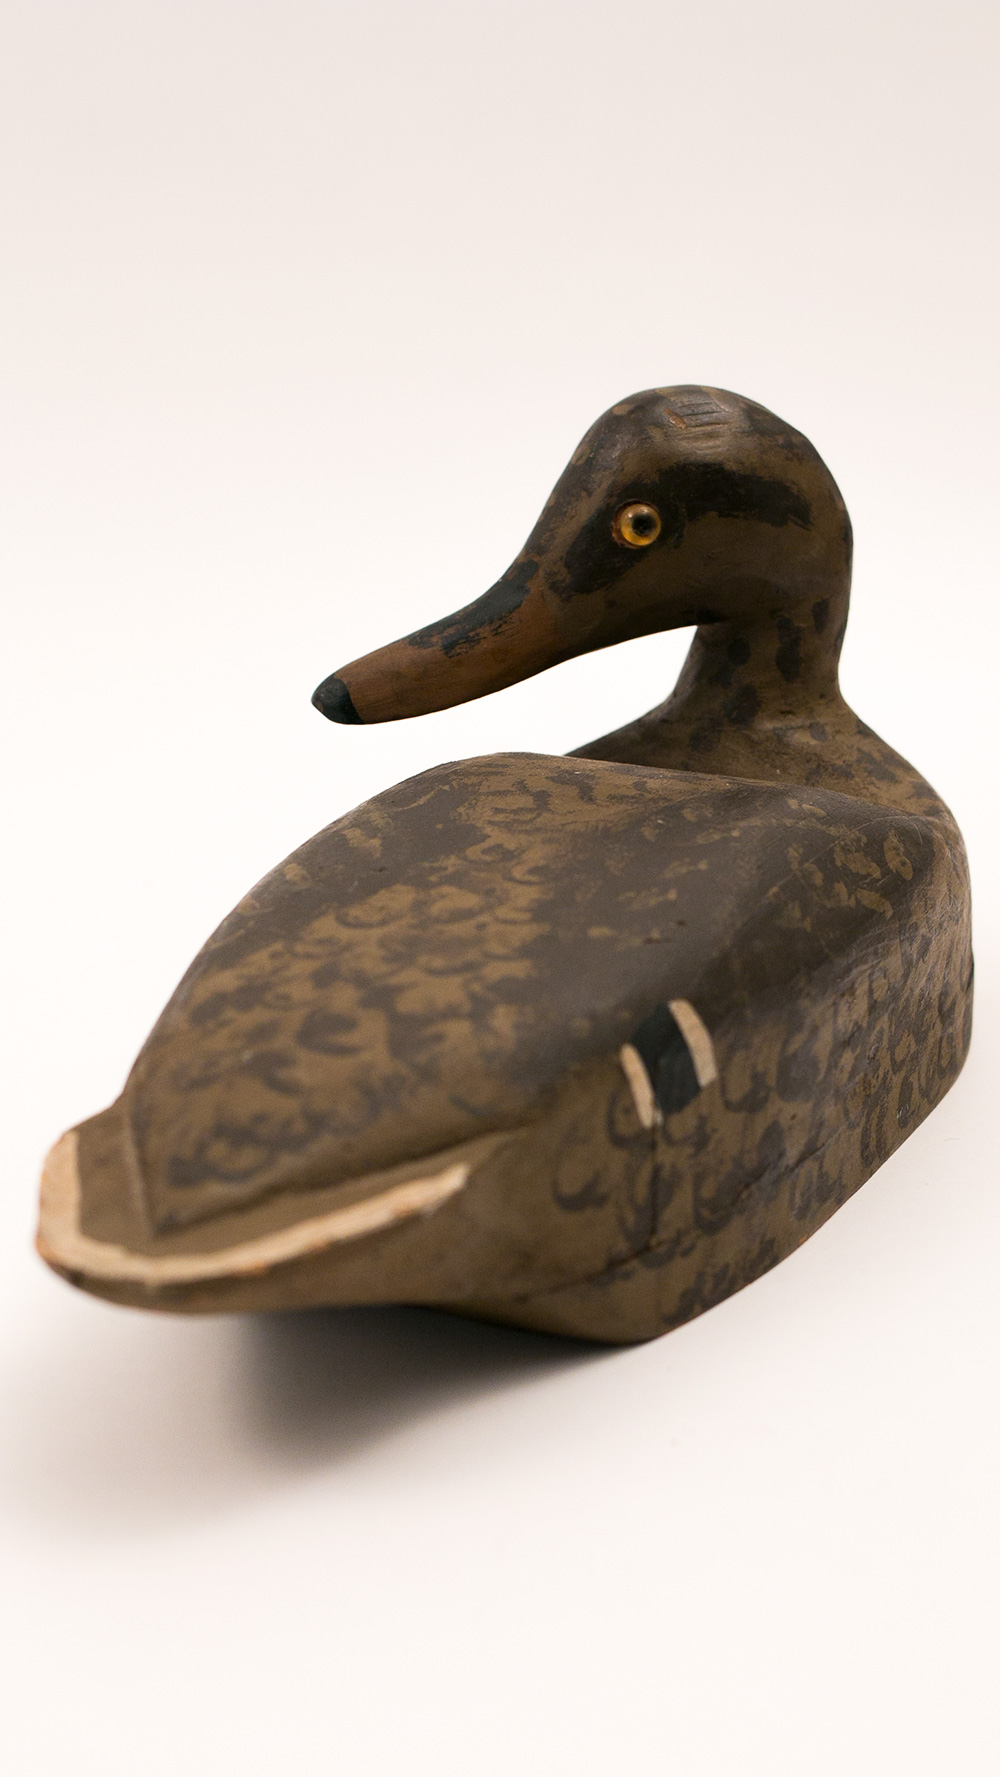 Antique Duck Decoys